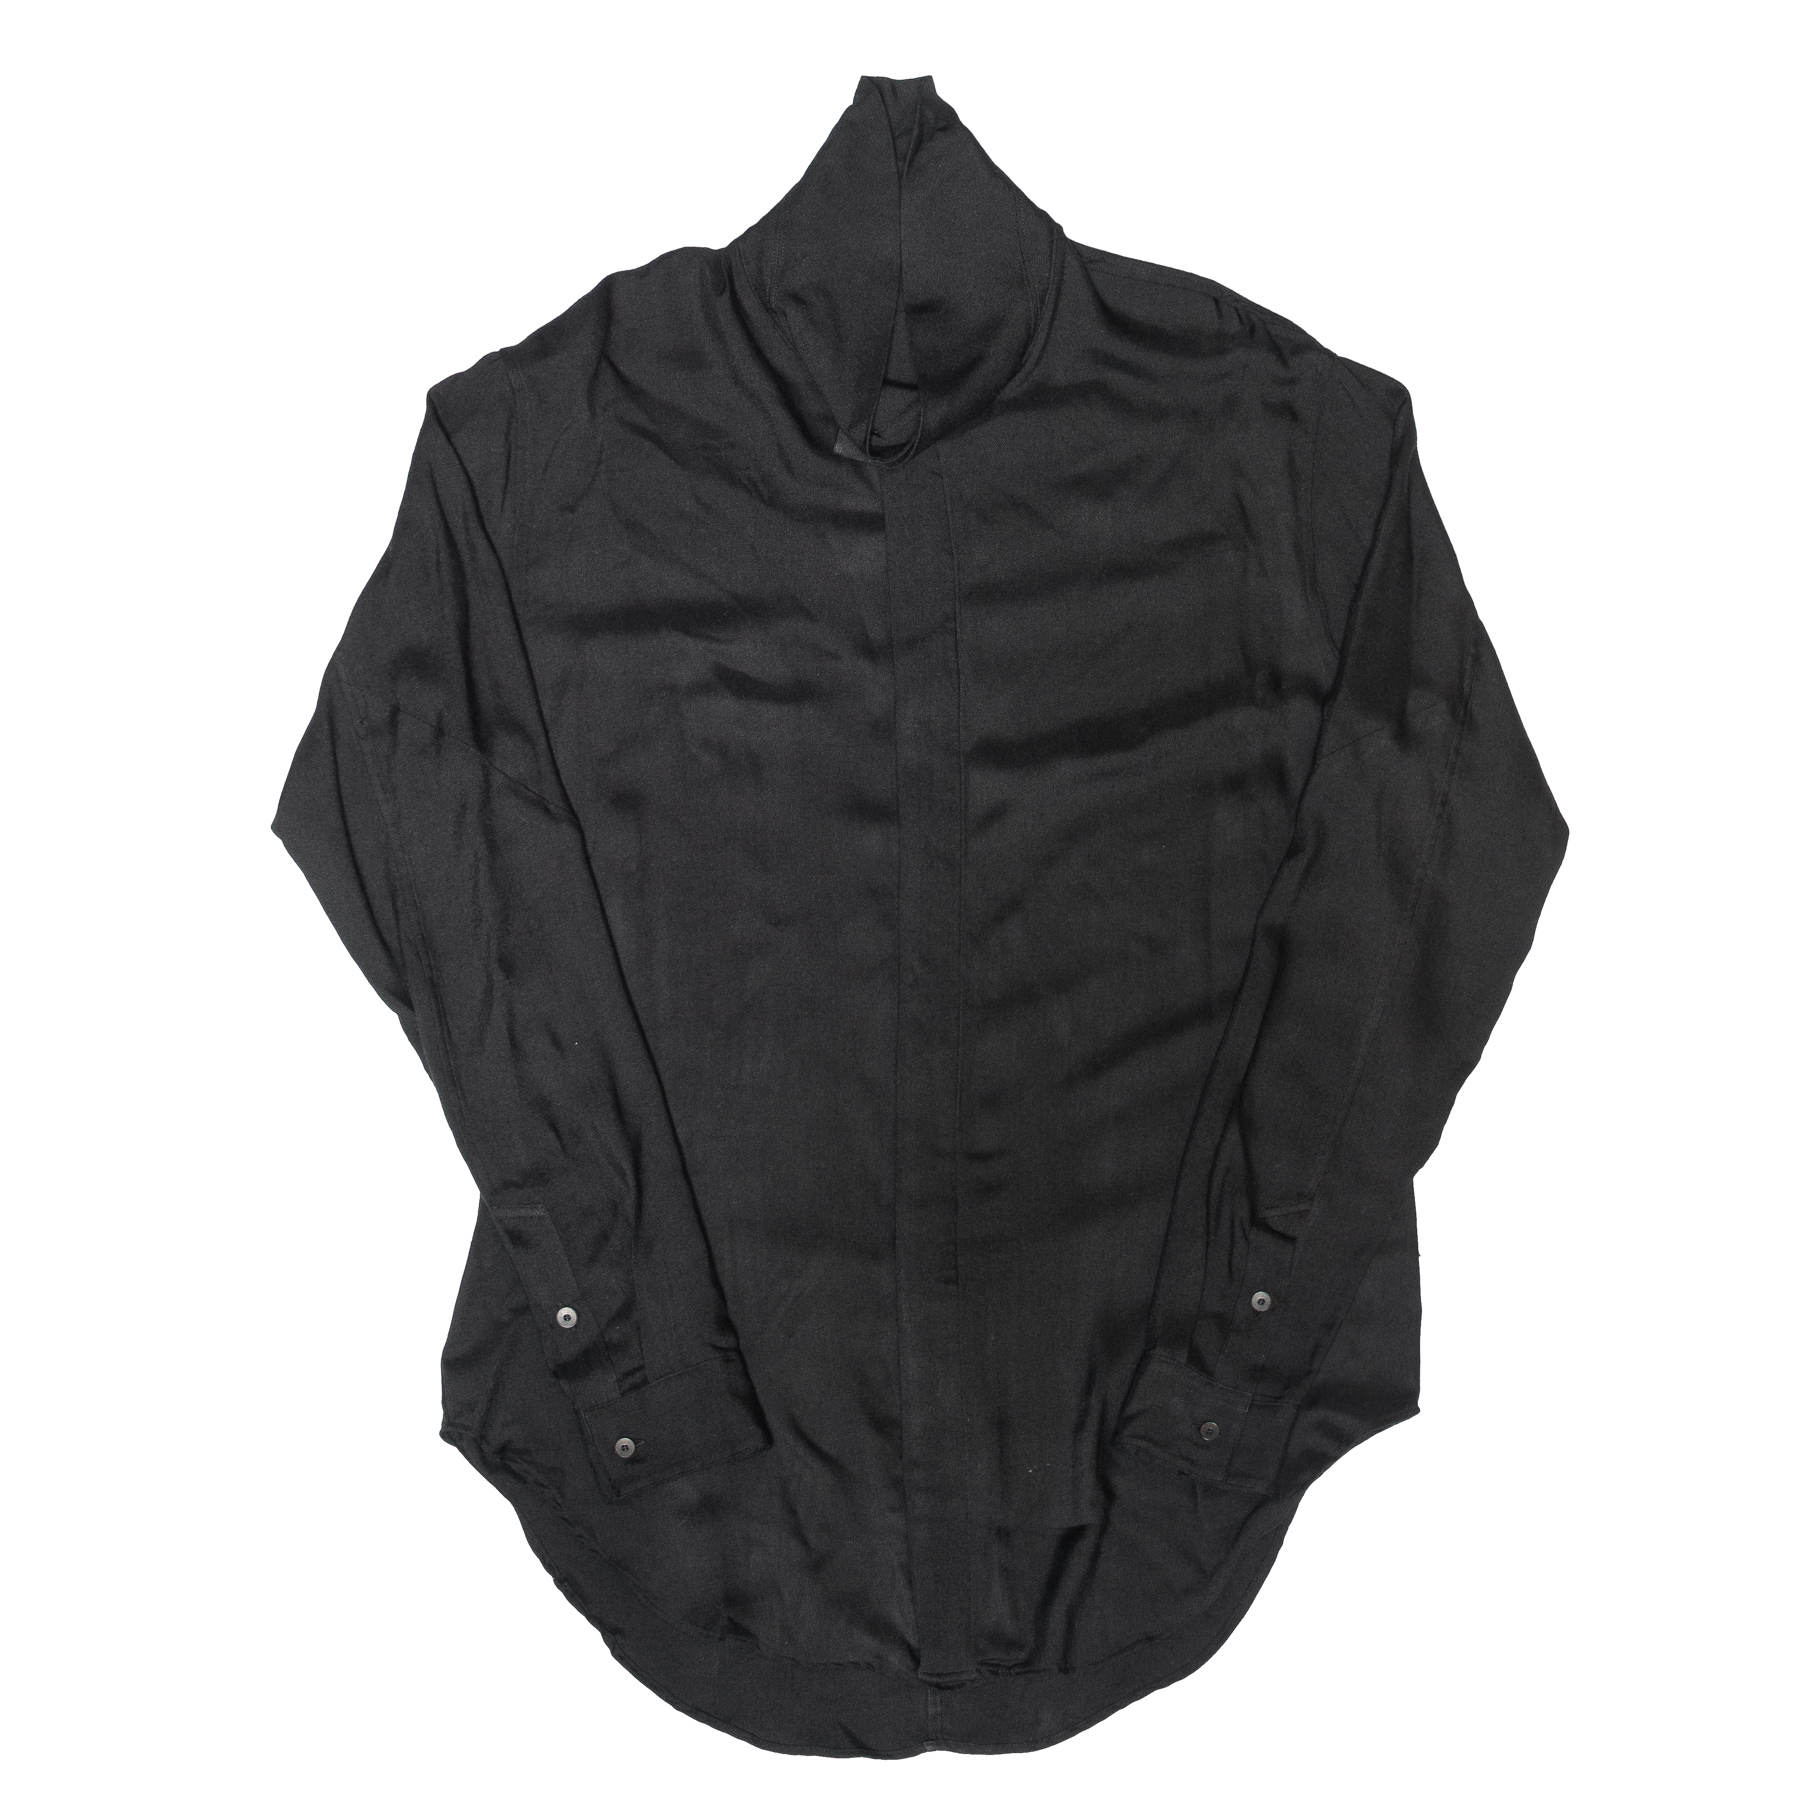 007SHM12-BLACK / ハイネックシャツ